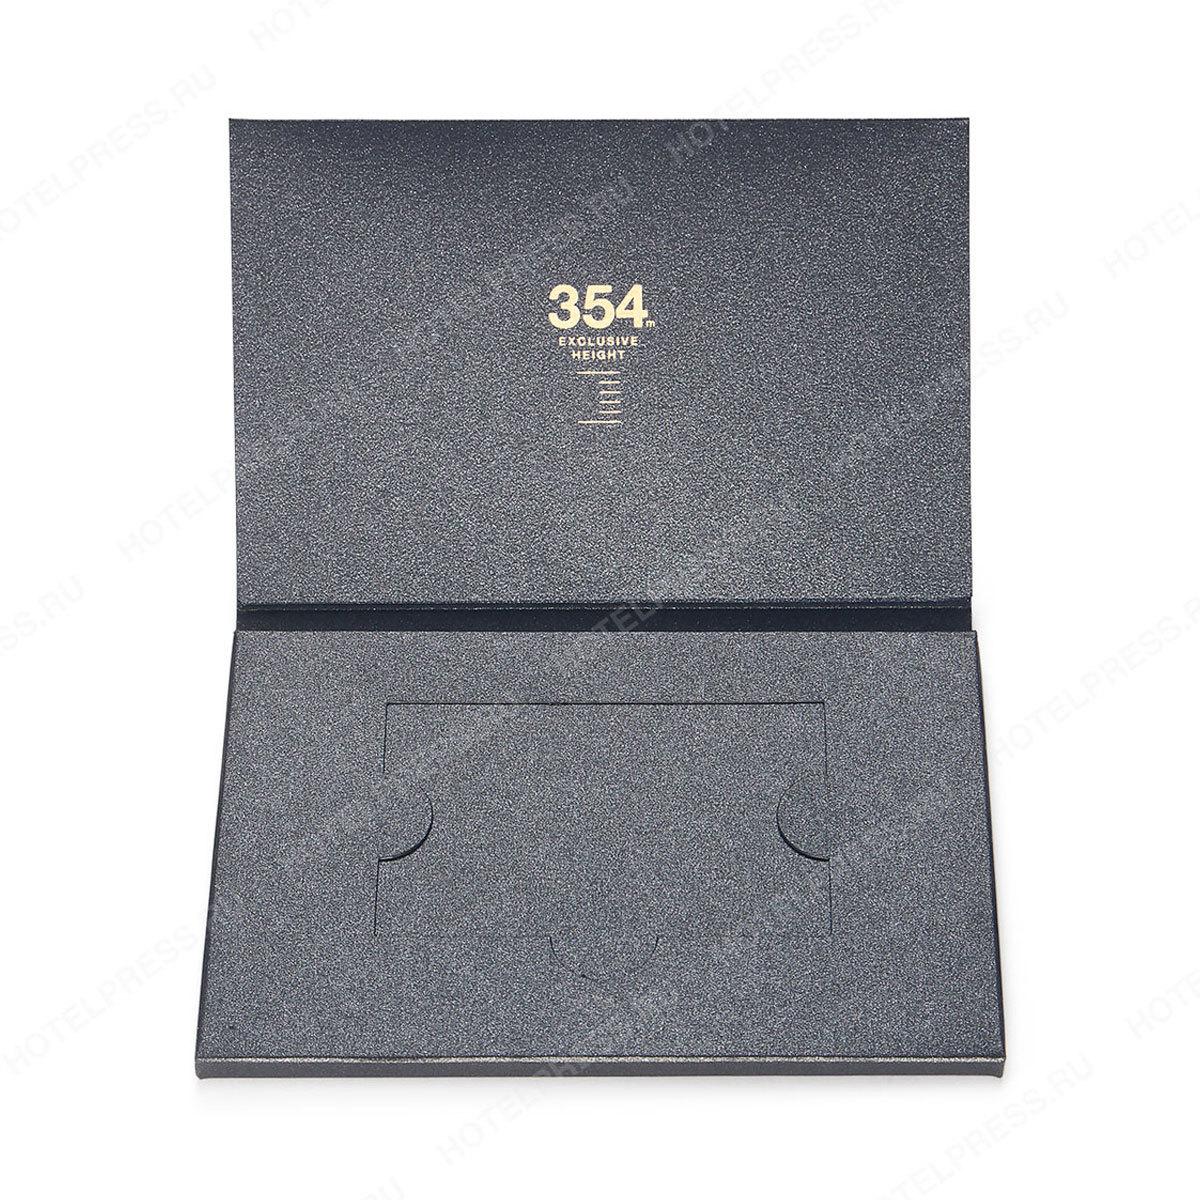 Коробка кардхолдер для пластиковой карты с логотипом 10х15 см